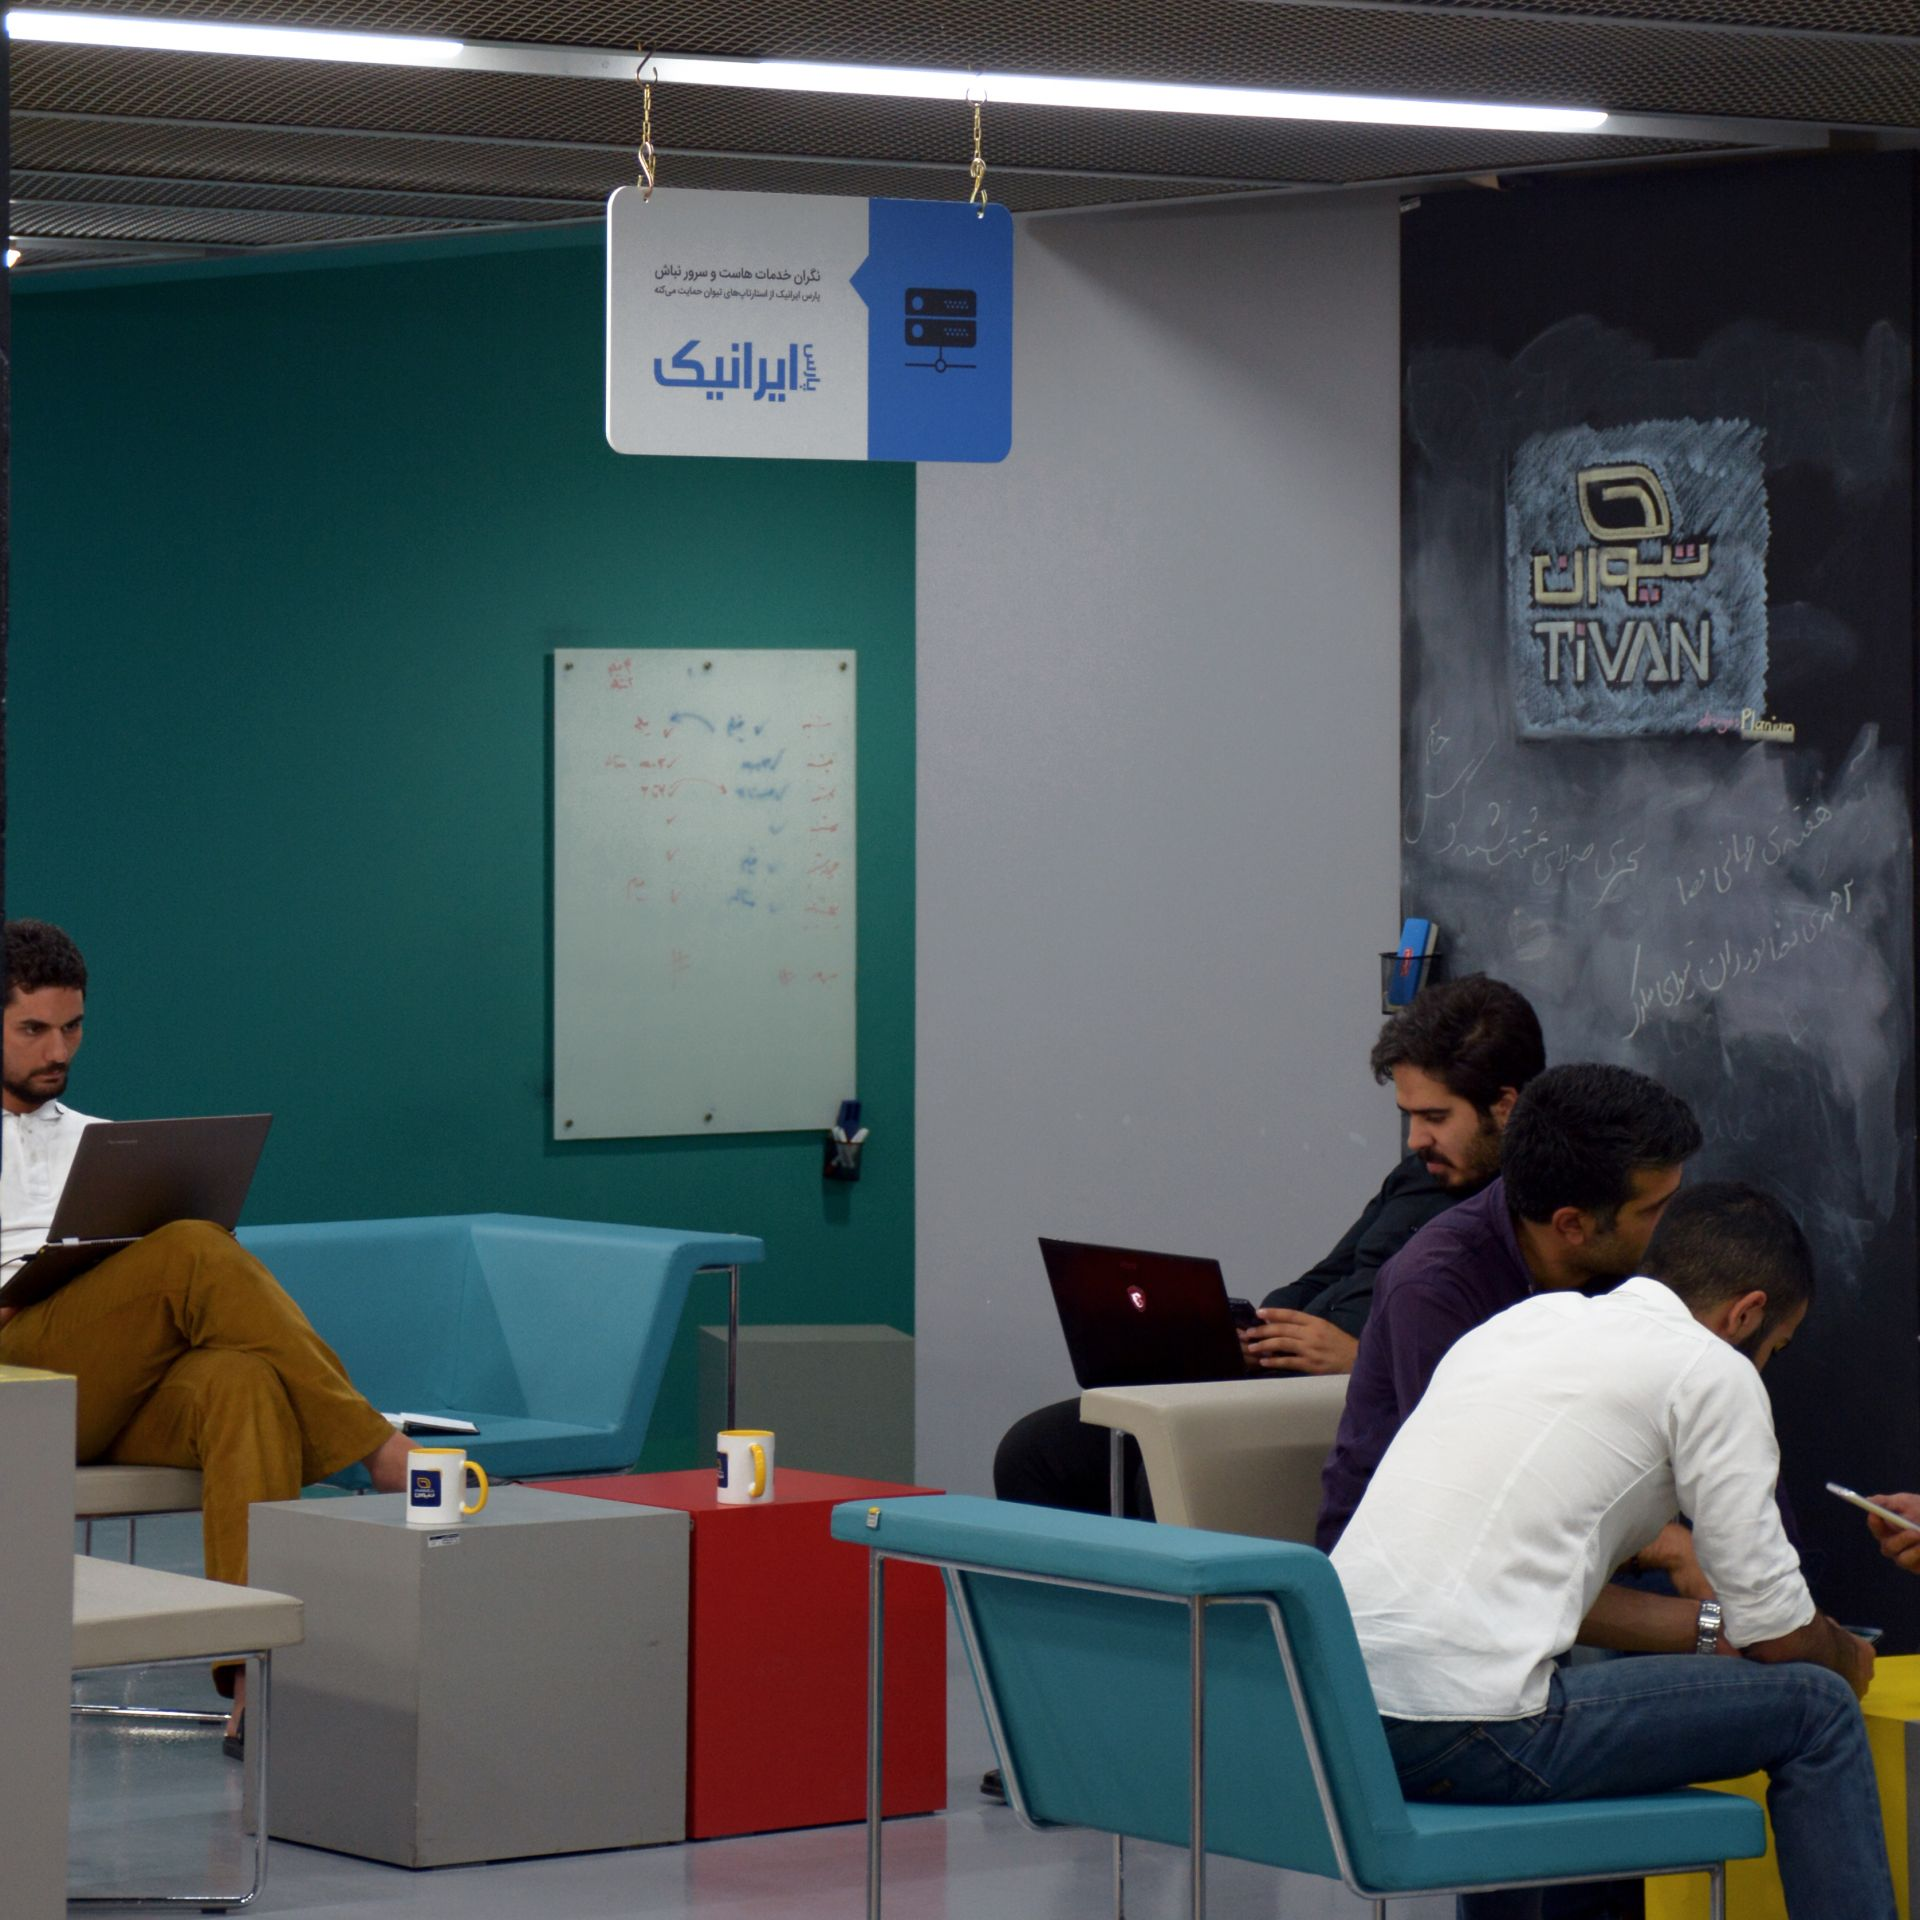 Tivan Entrepreneurship Club, Tehran